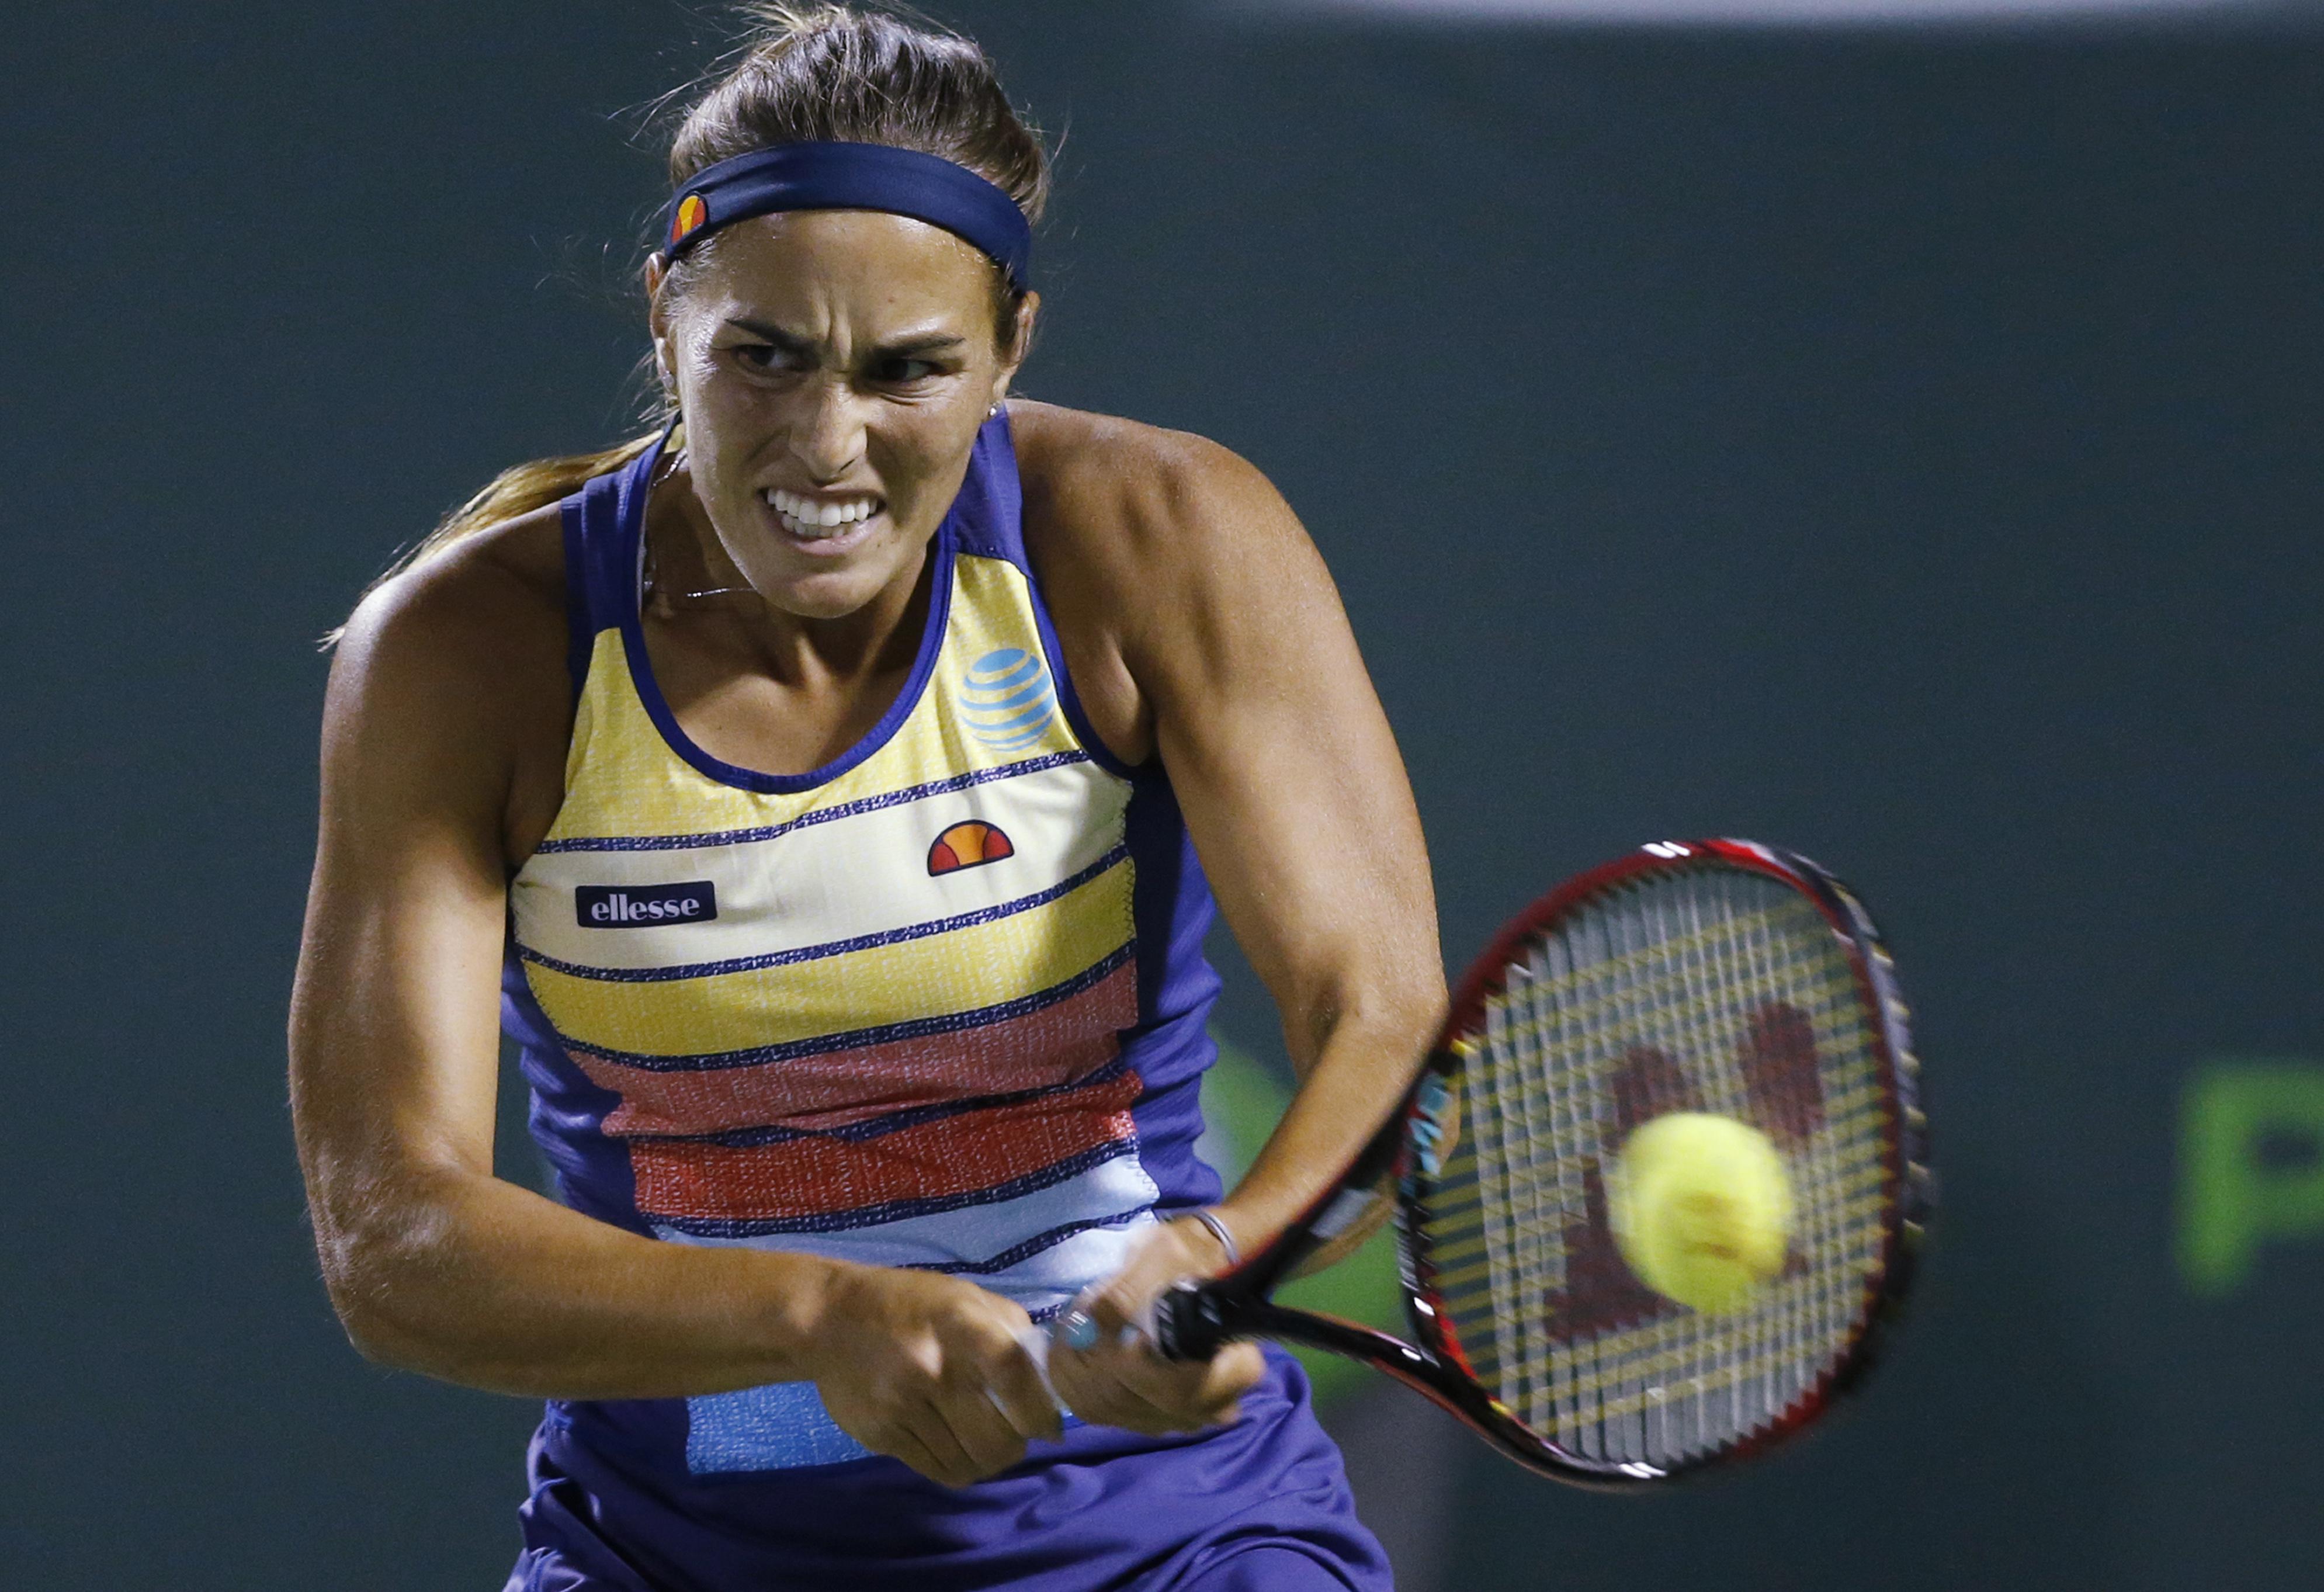 Caroline Wozniacki lost to Monica Puig